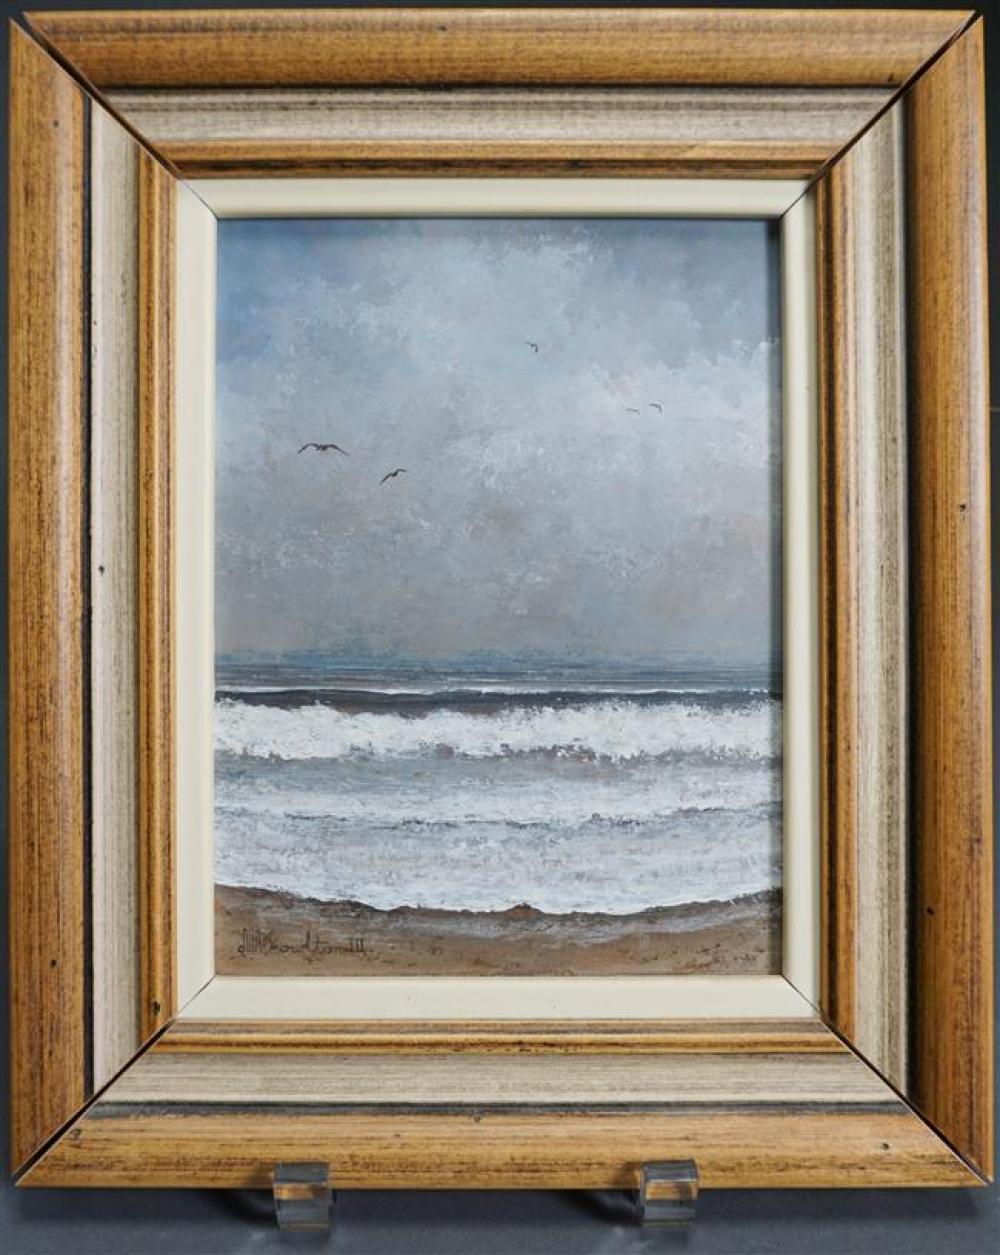 David Knowlton III (American b. 1941), Crashing Waves, Oil on Board (damage to frame), Framed 11-1/2 x 9-1/2 inches